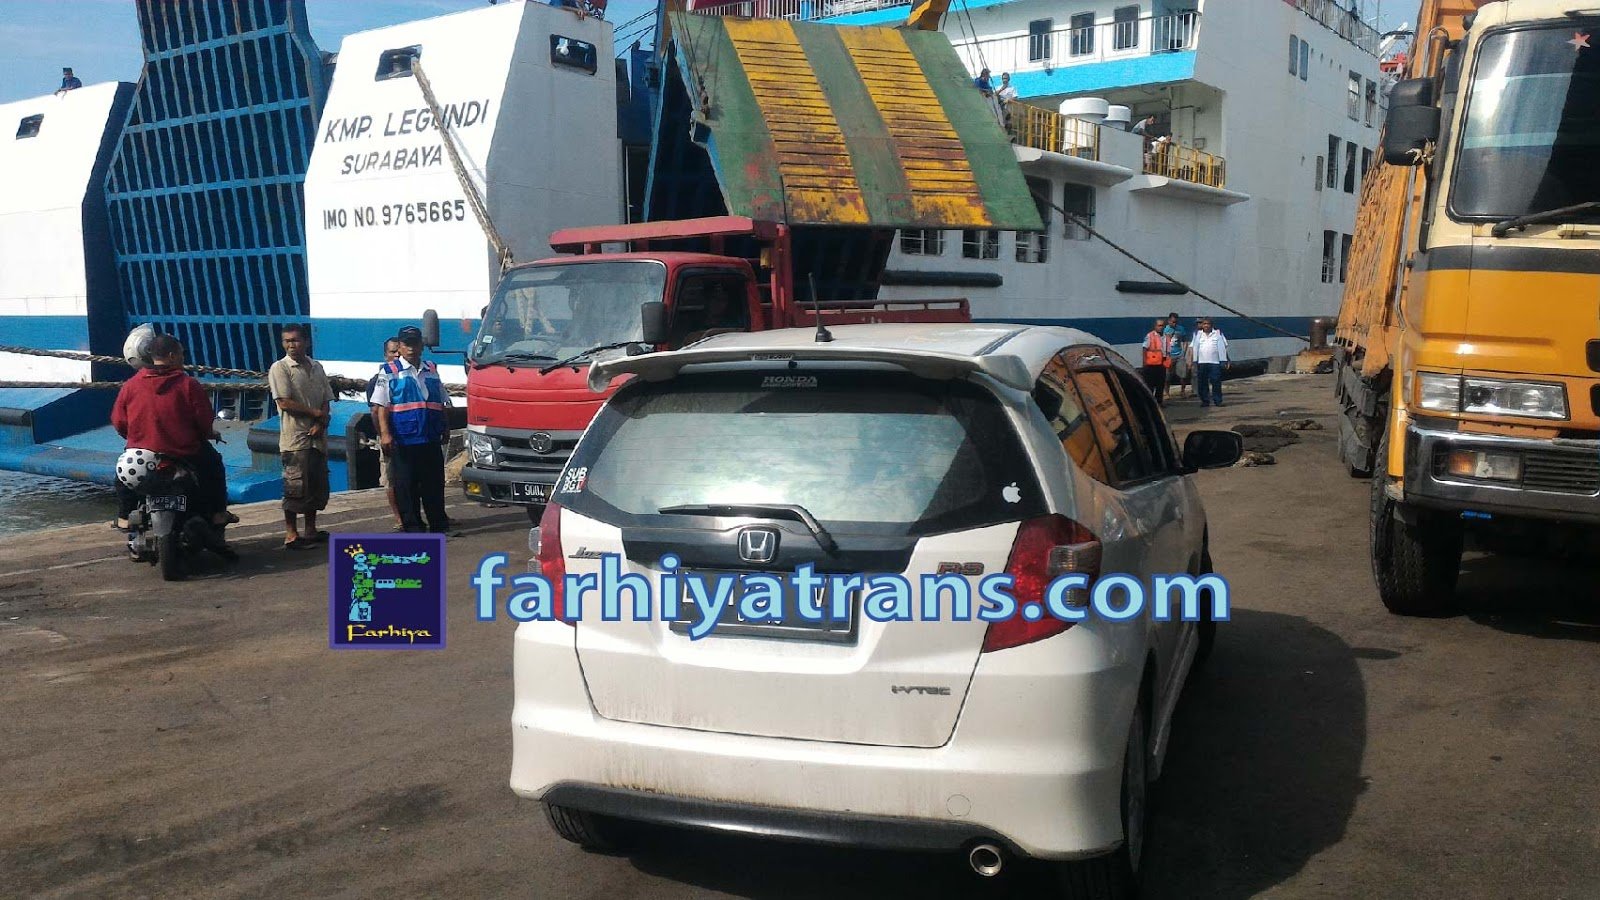 ekspedisi pengiriman mobil surabaya jakarta kapal ferry cargo container pelni cepat murah terpercaya online